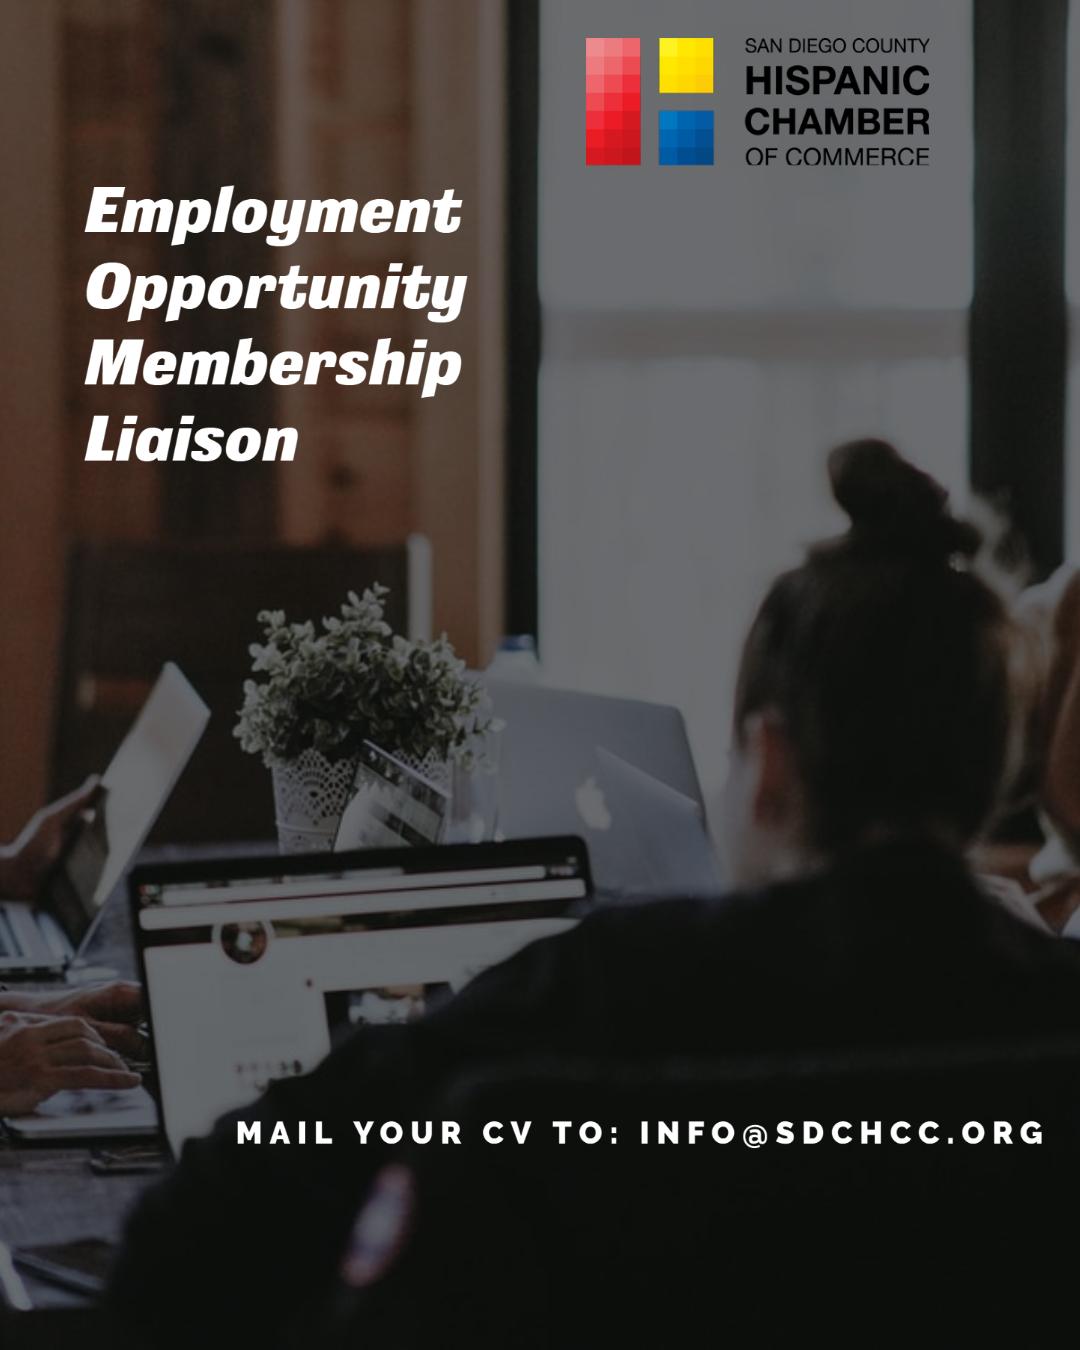 Membership Liaison